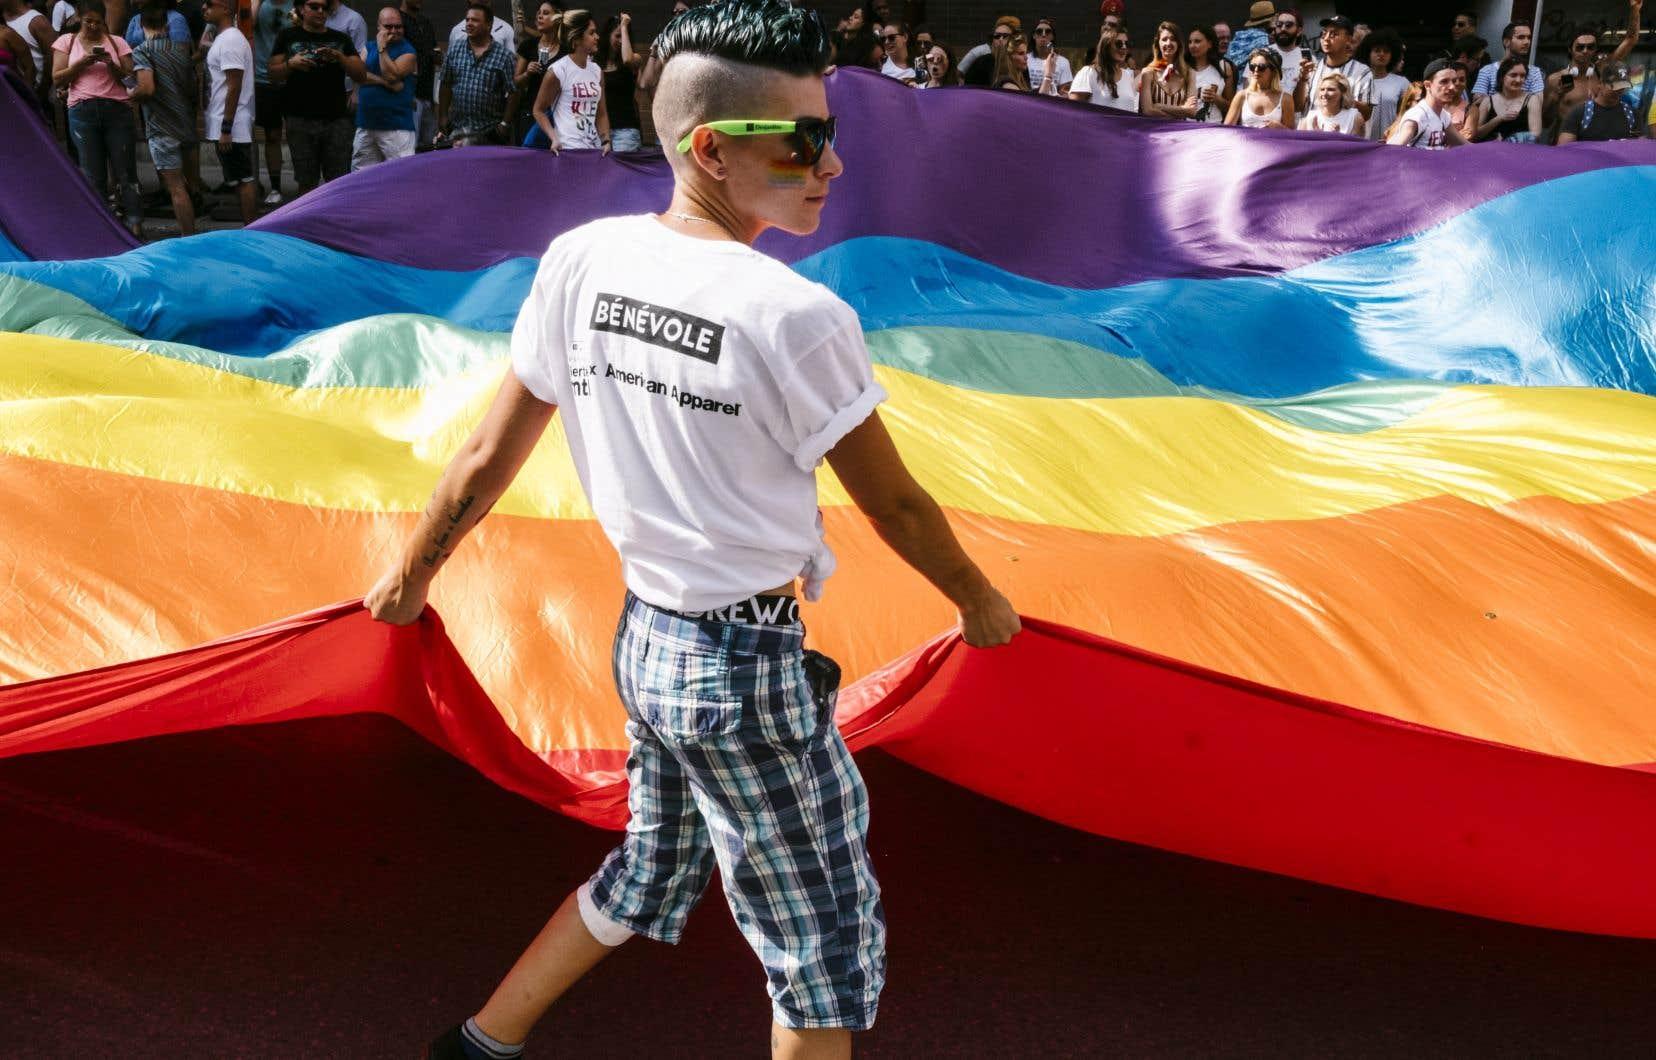 Matthew Todd raconte l'émancipation des LGBTQ de Stonewall à aujourd'hui.